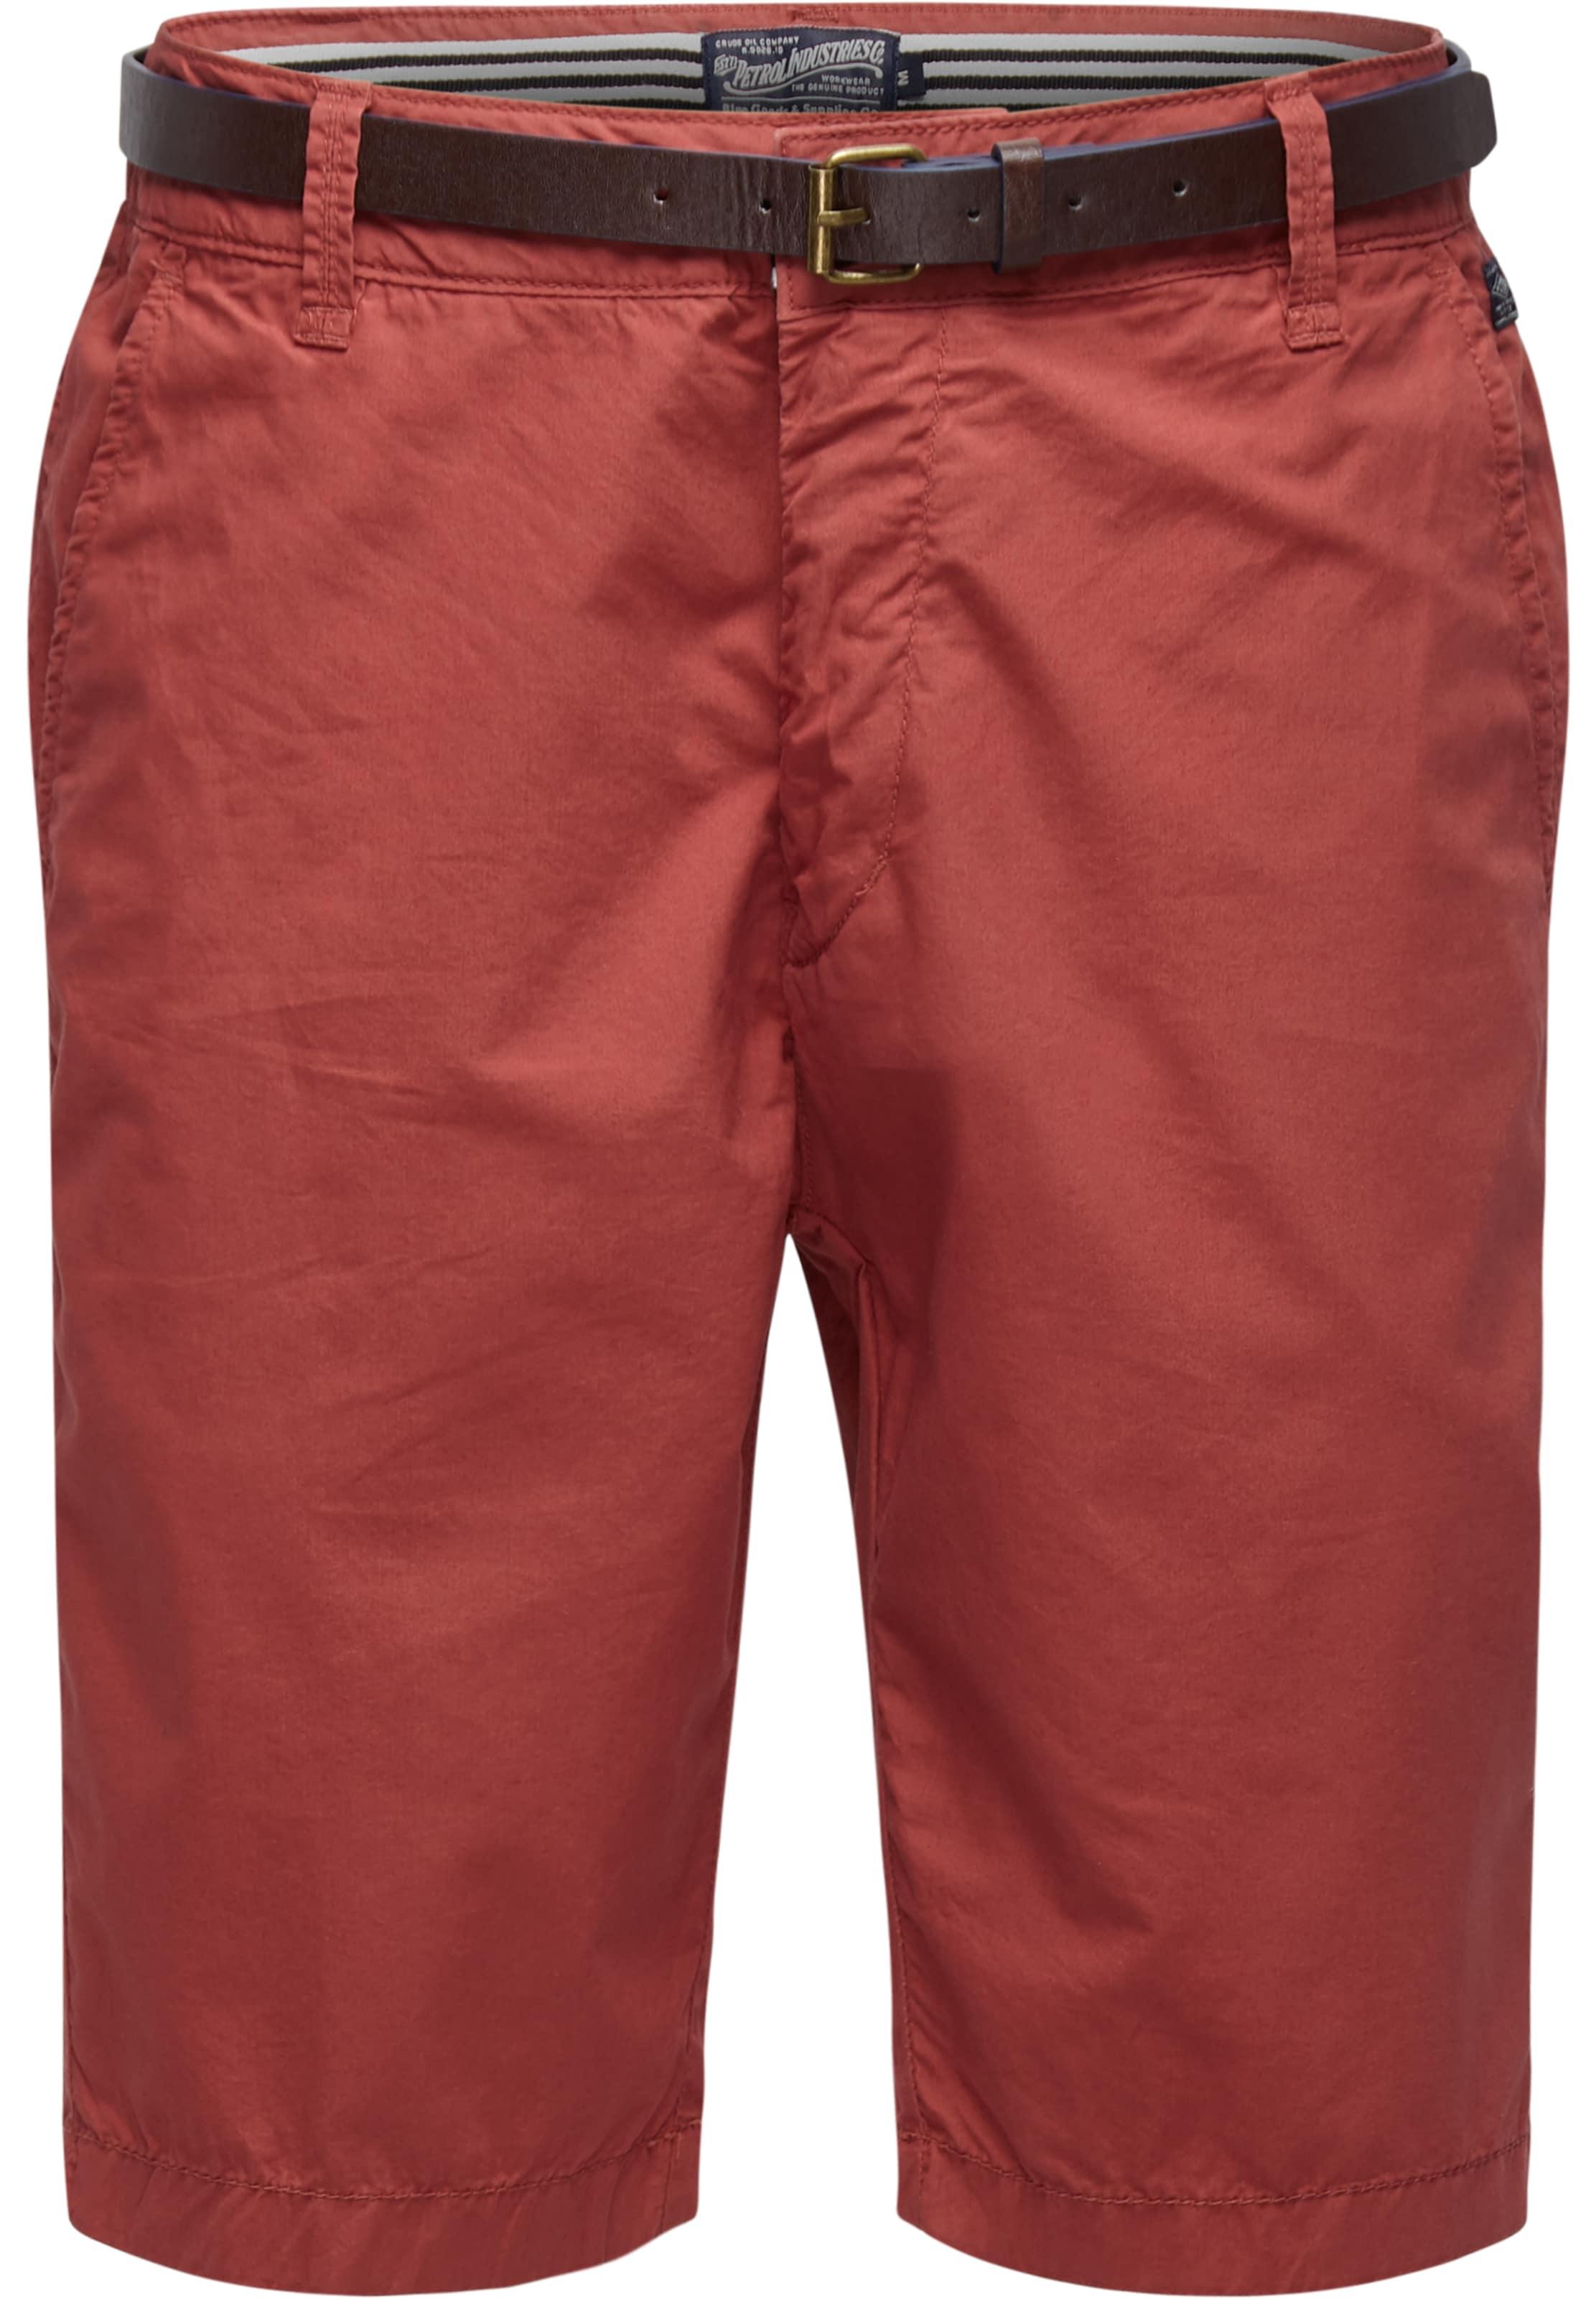 Shorts Shorts In Industries Petrol Industries In Rot Petrol e2IbWEHYD9